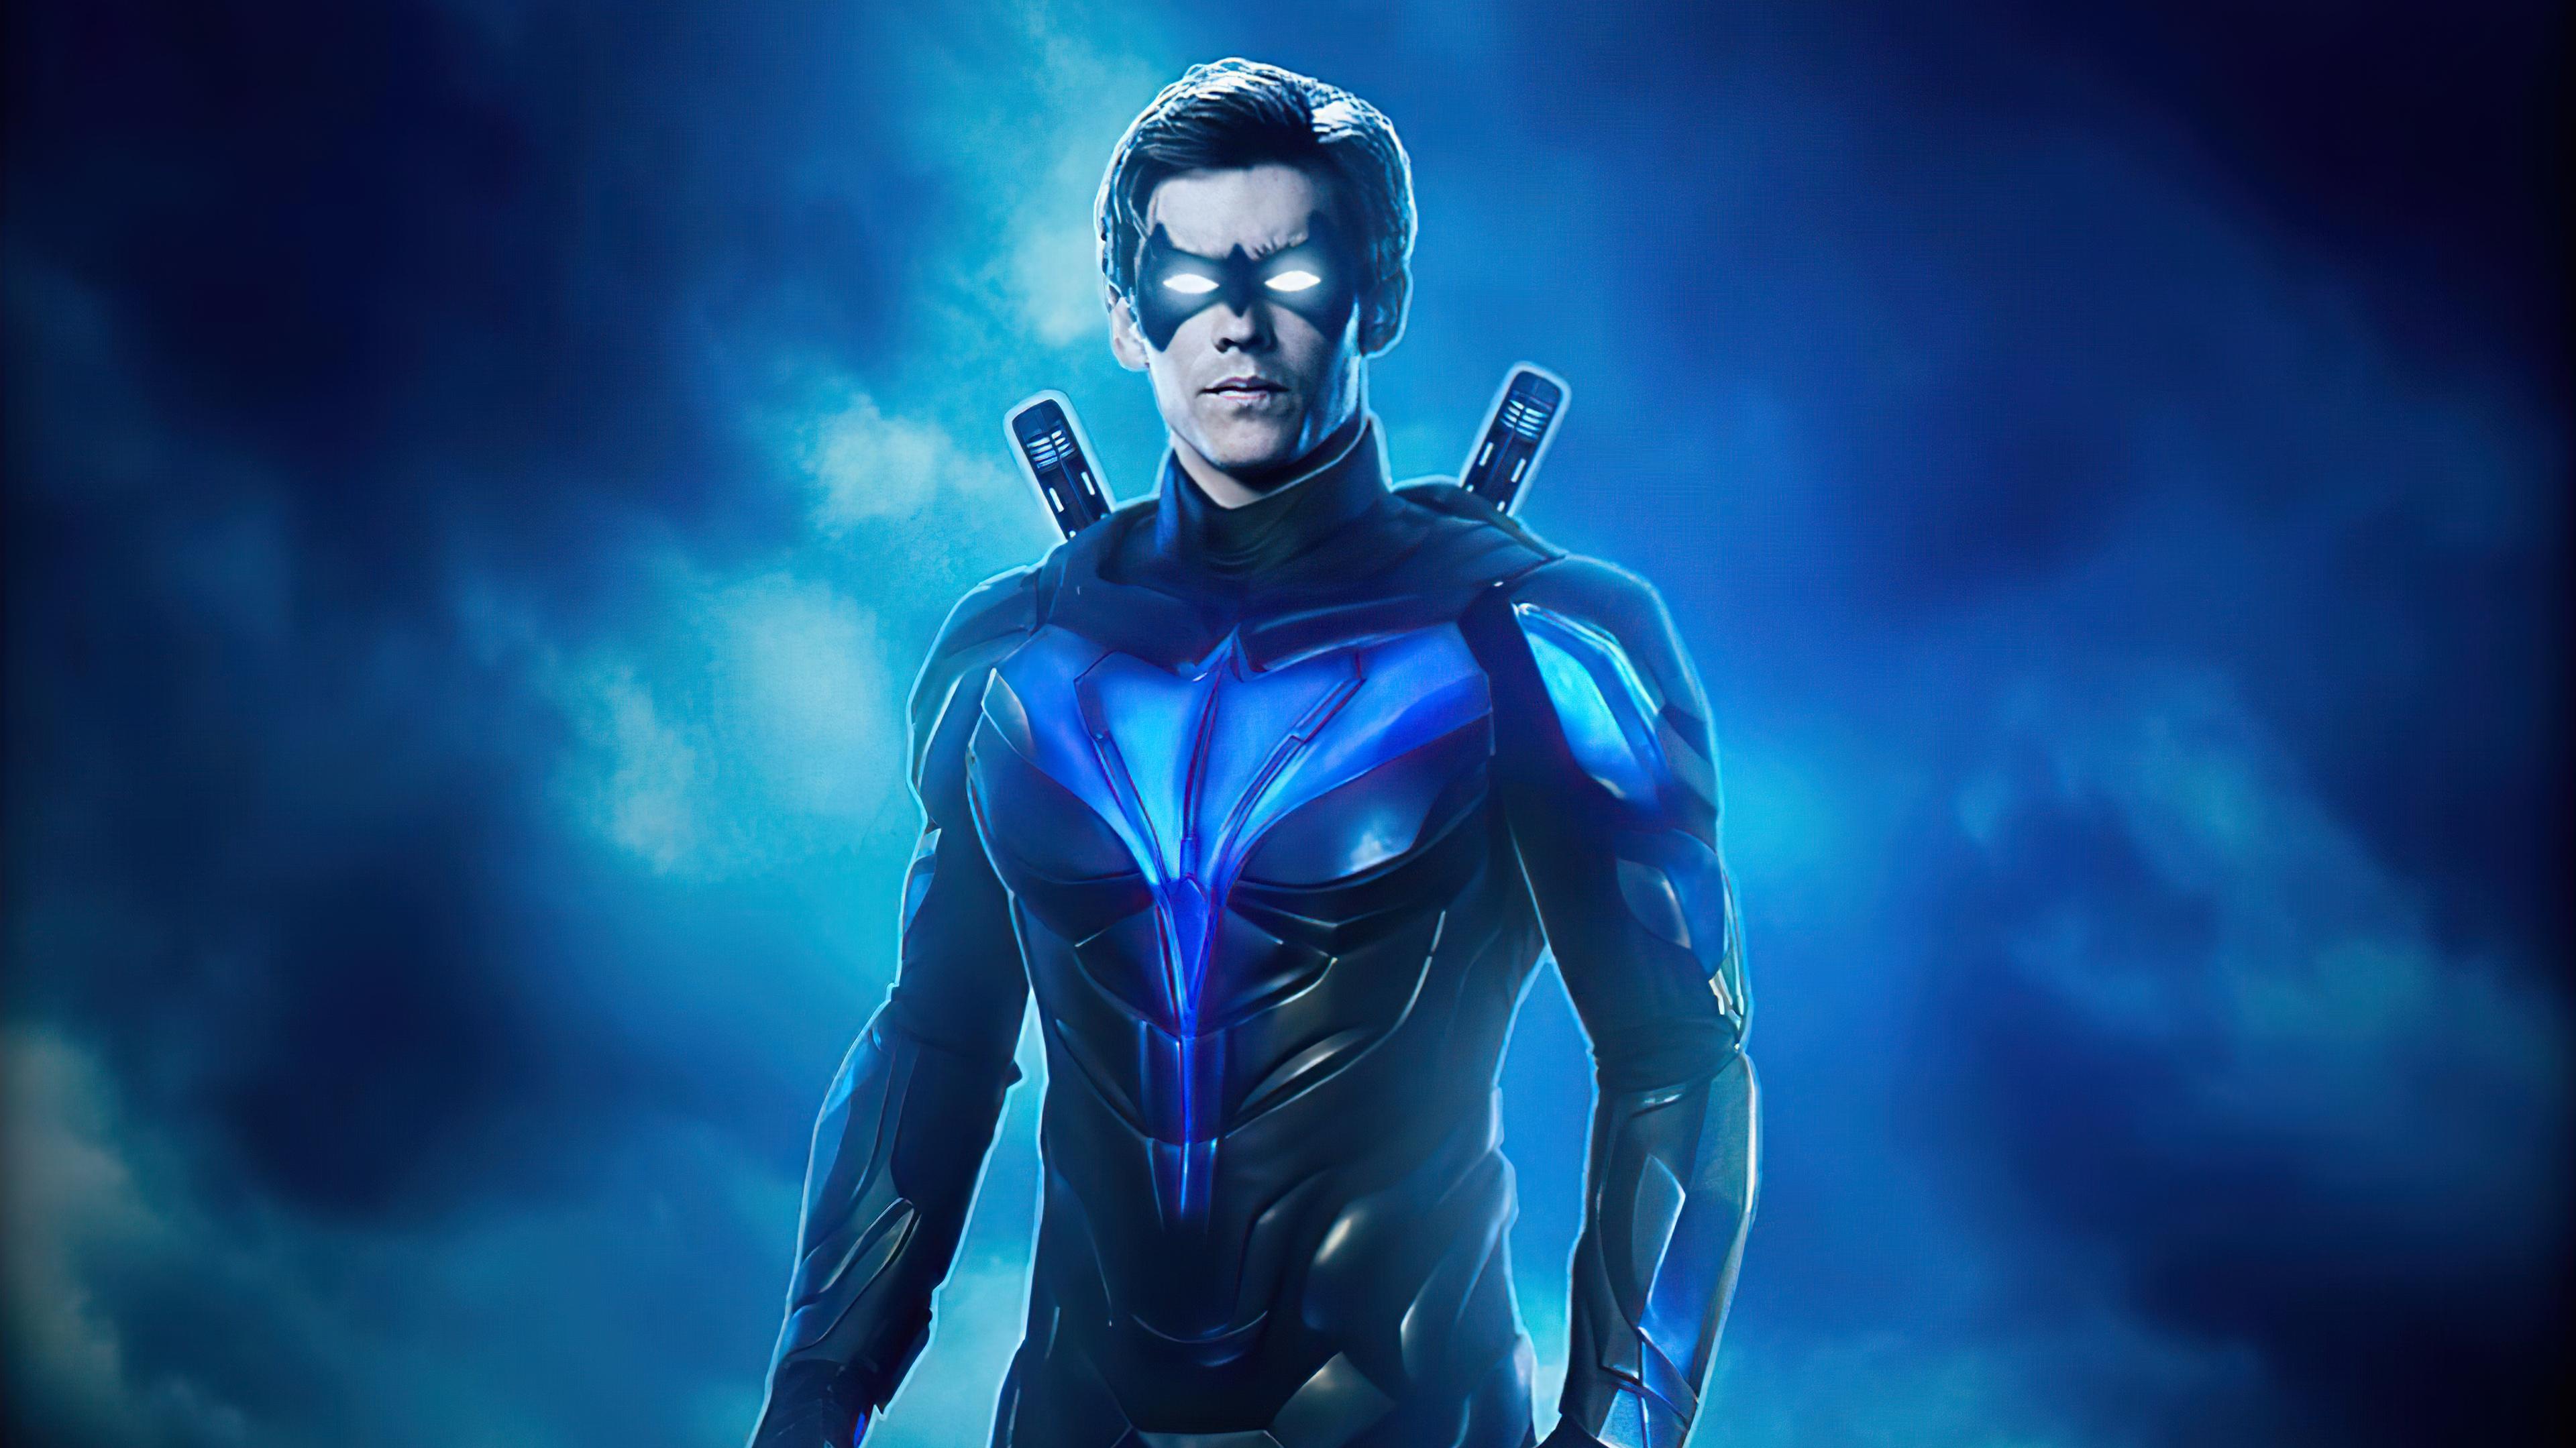 nightwing blue suit 4k 1617445731 - Nightwing Blue Suit 4k - Nightwing Blue Suit 4k wallpapers